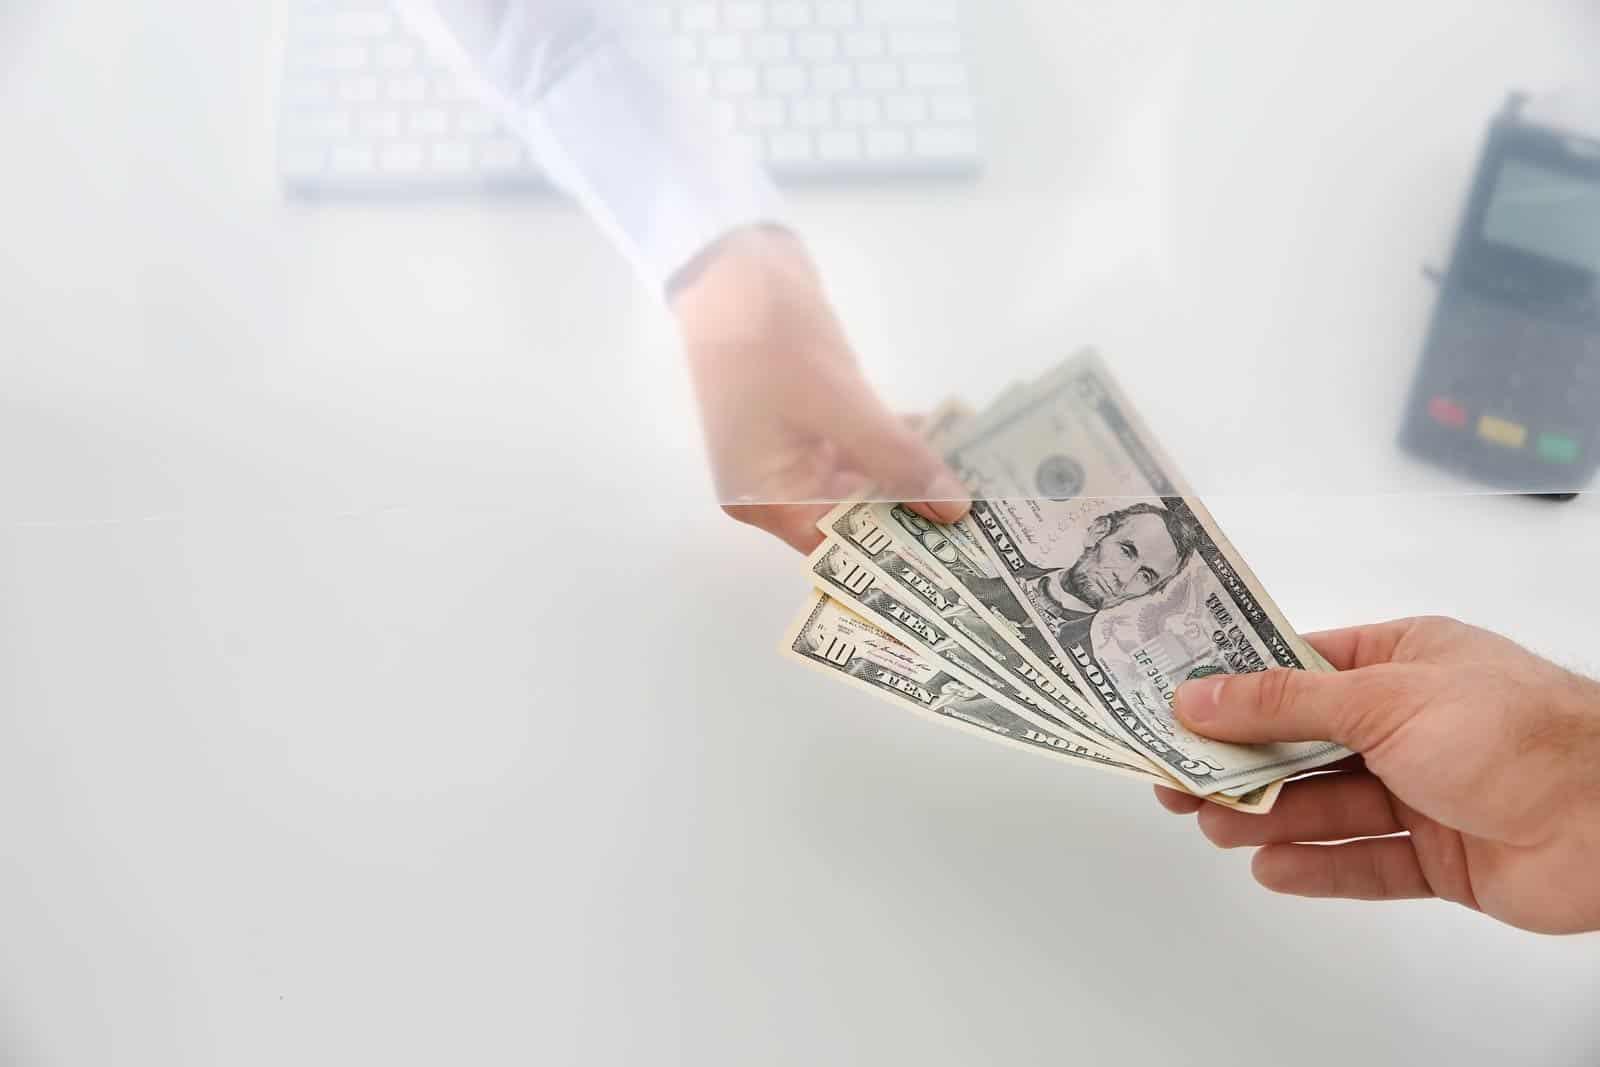 Splitska banka krediti na ostatak primanja